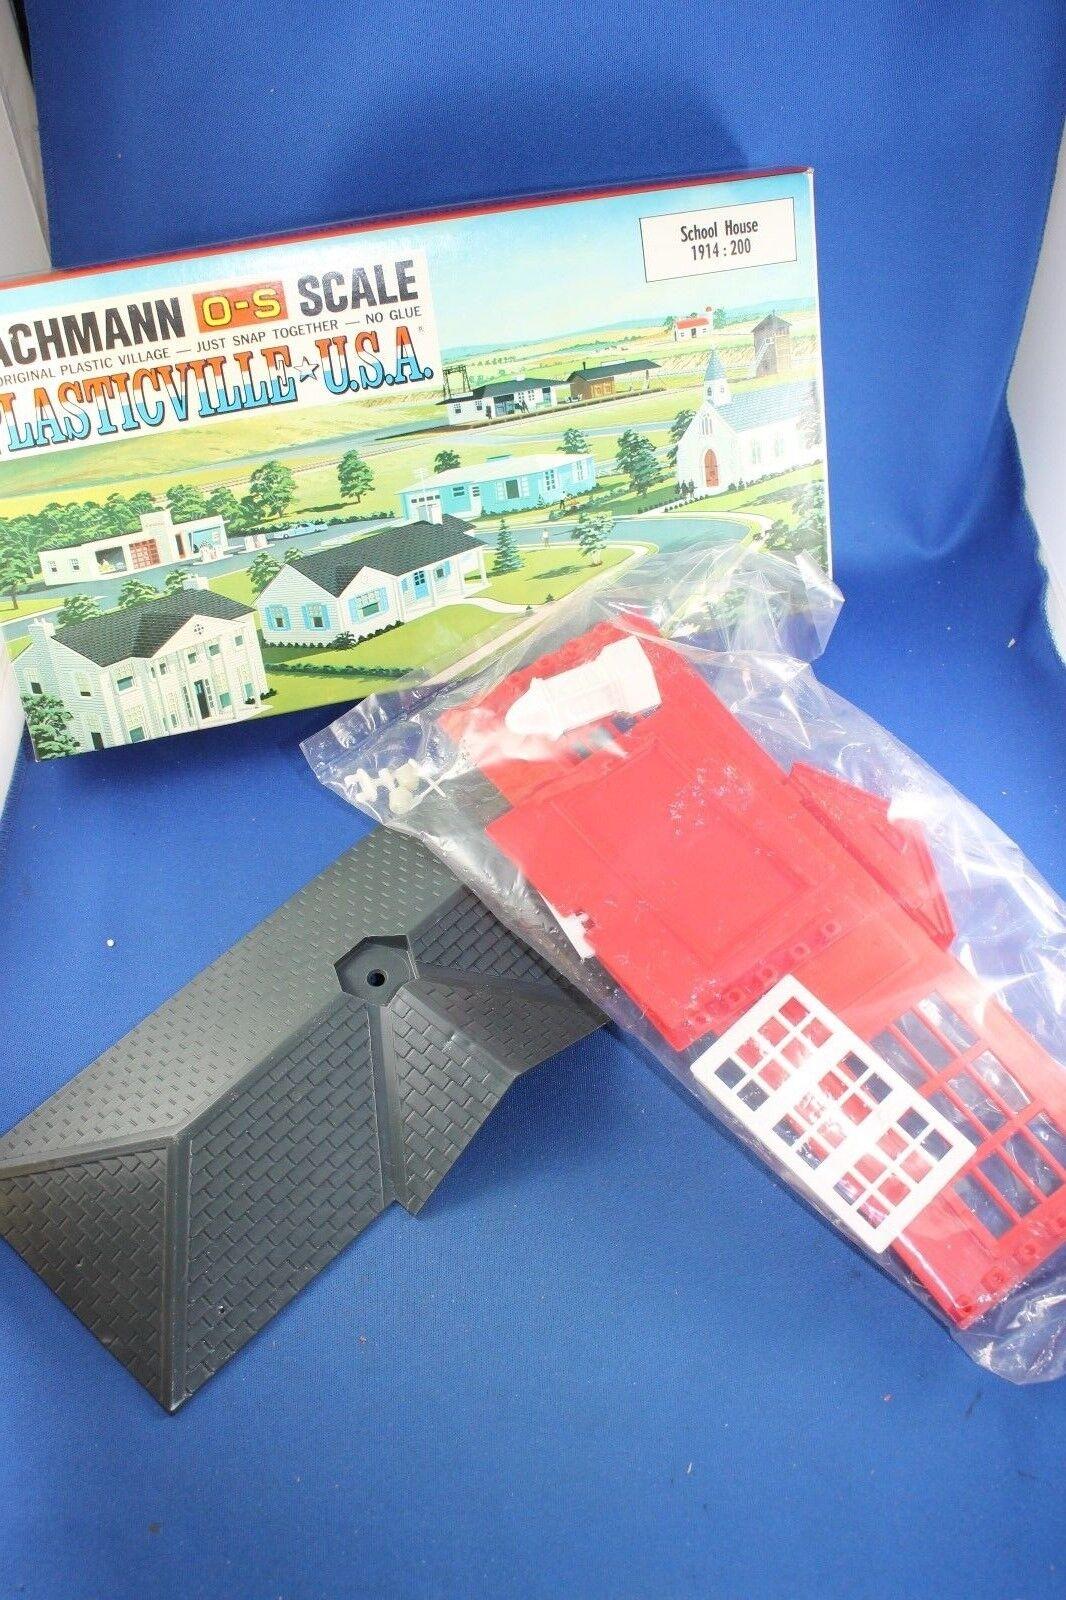 Plasticville - O-O27 - School House - Sealed Bag - Complete